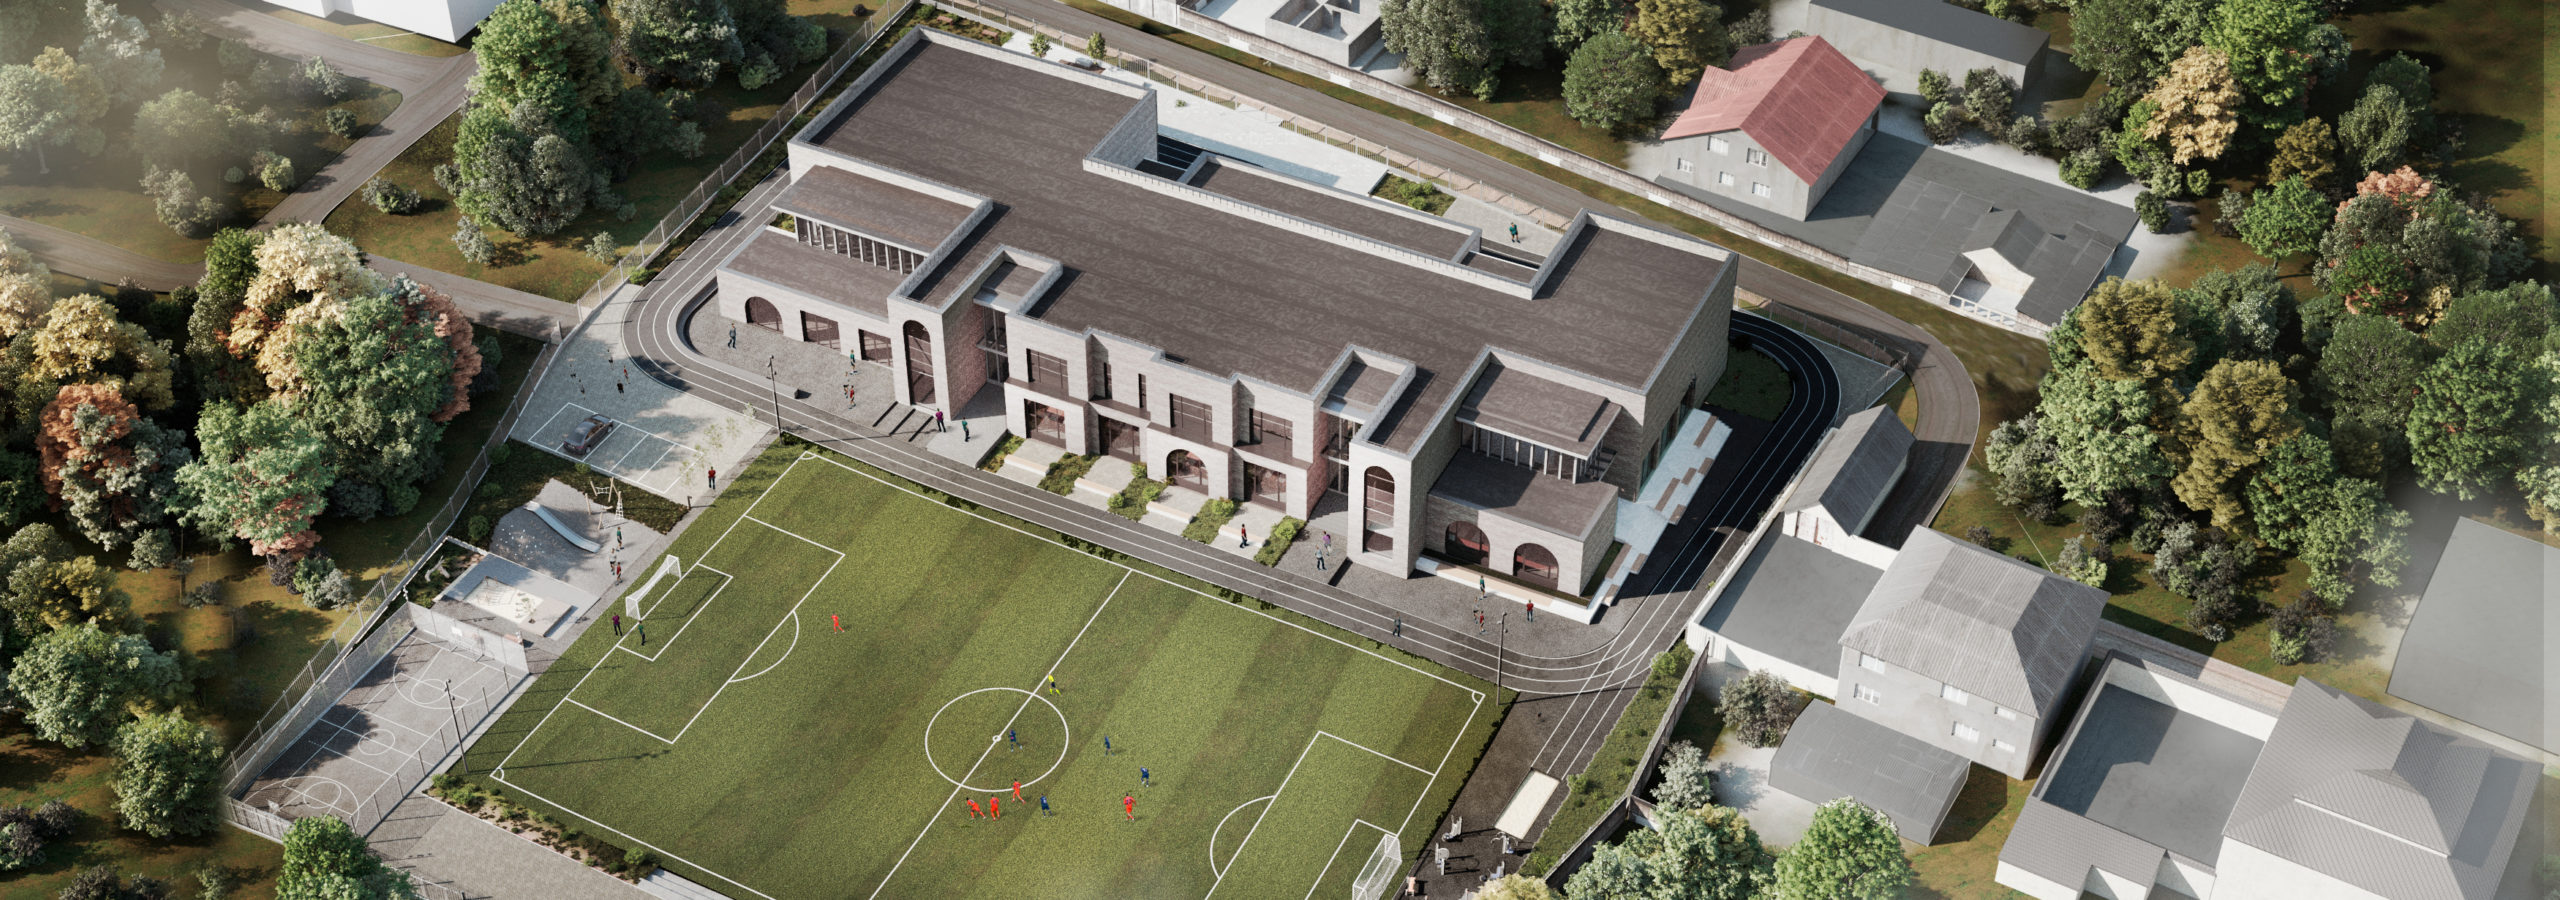 Концепция школы в Дагестане